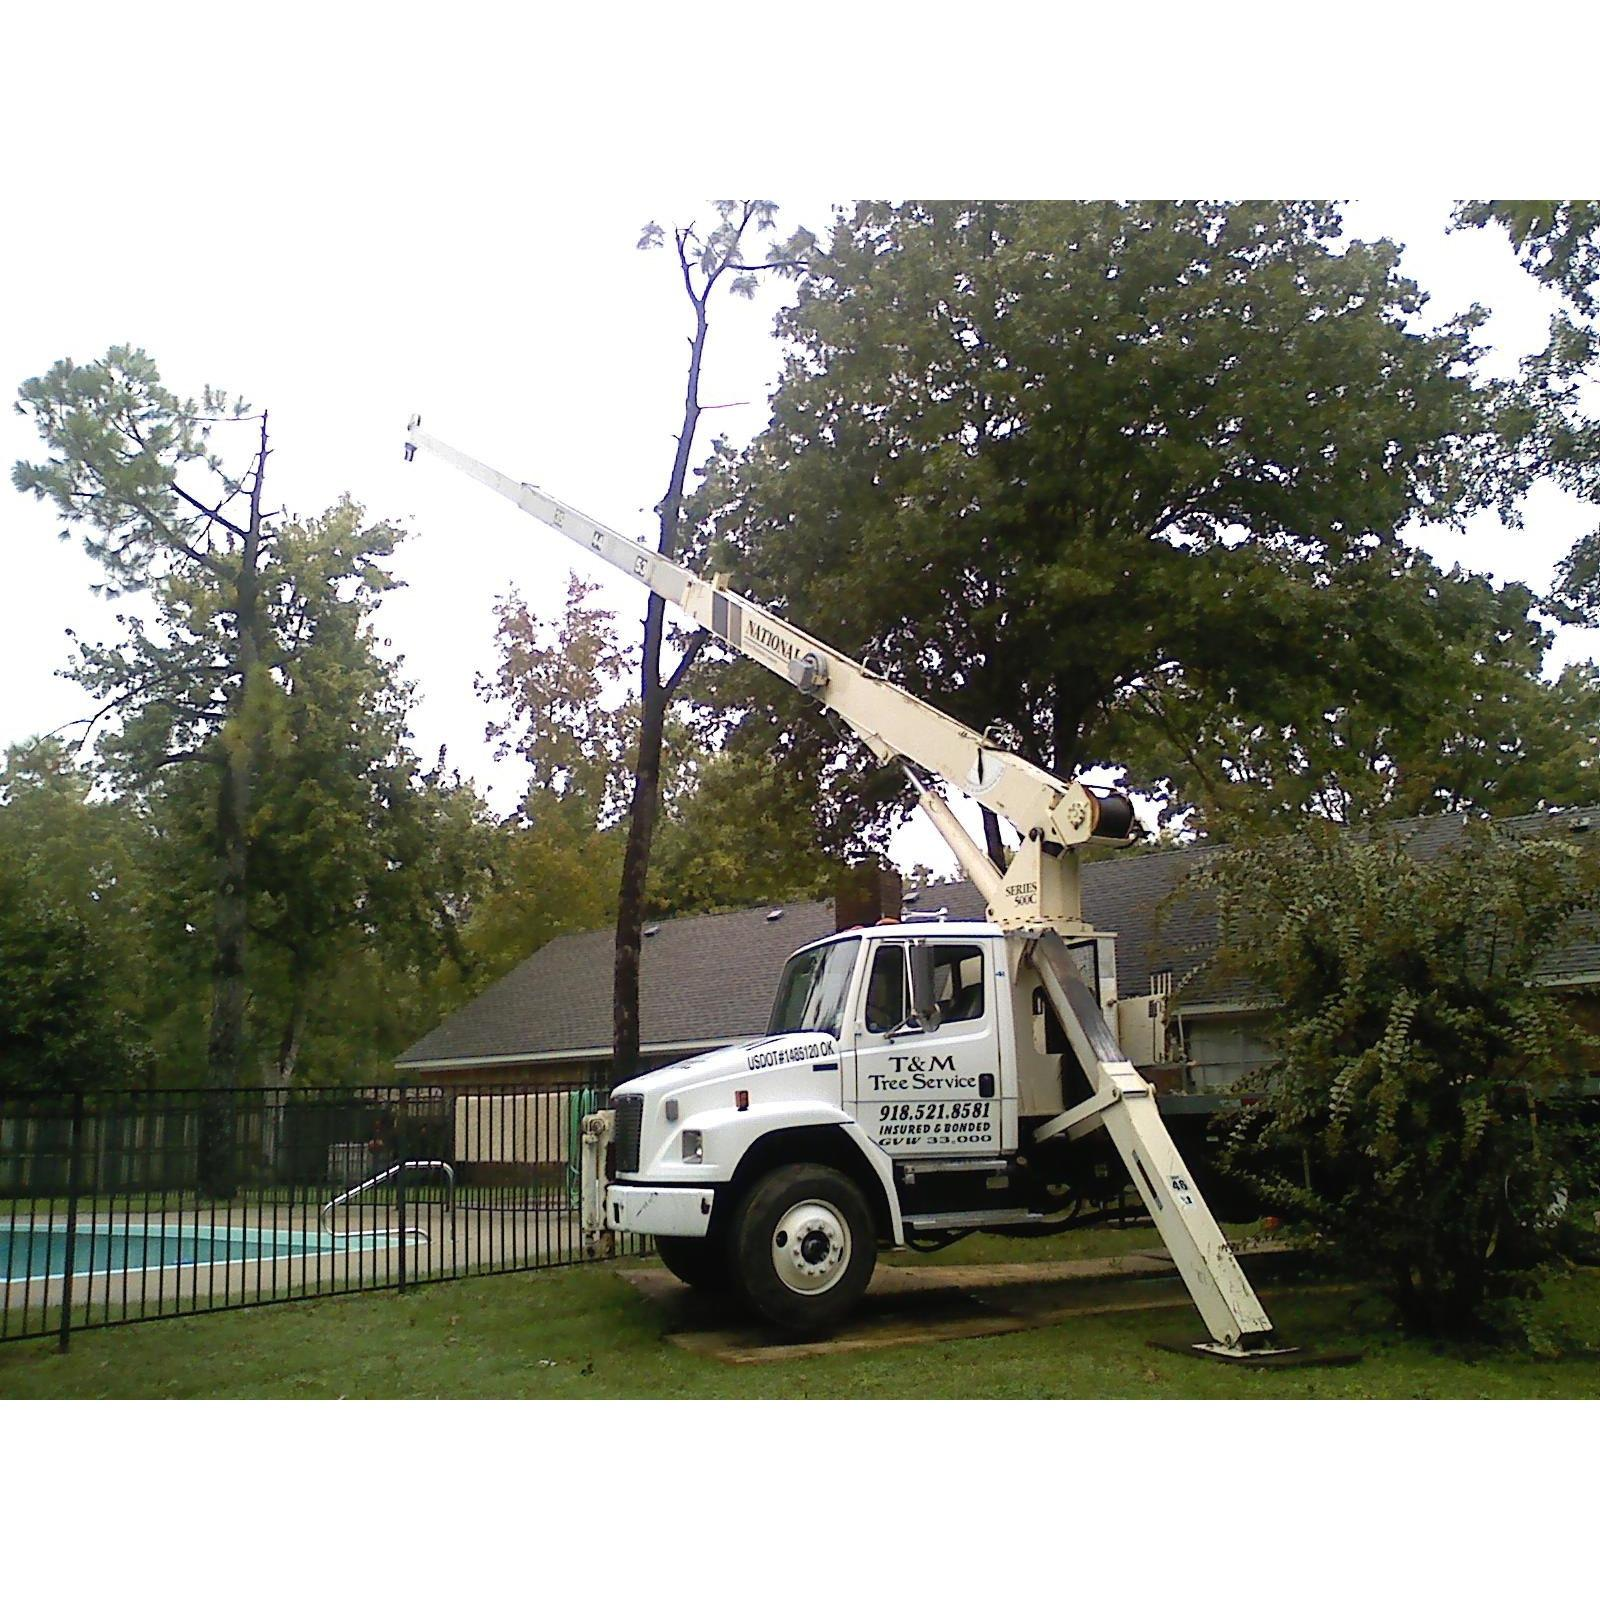 T & M Tree Service